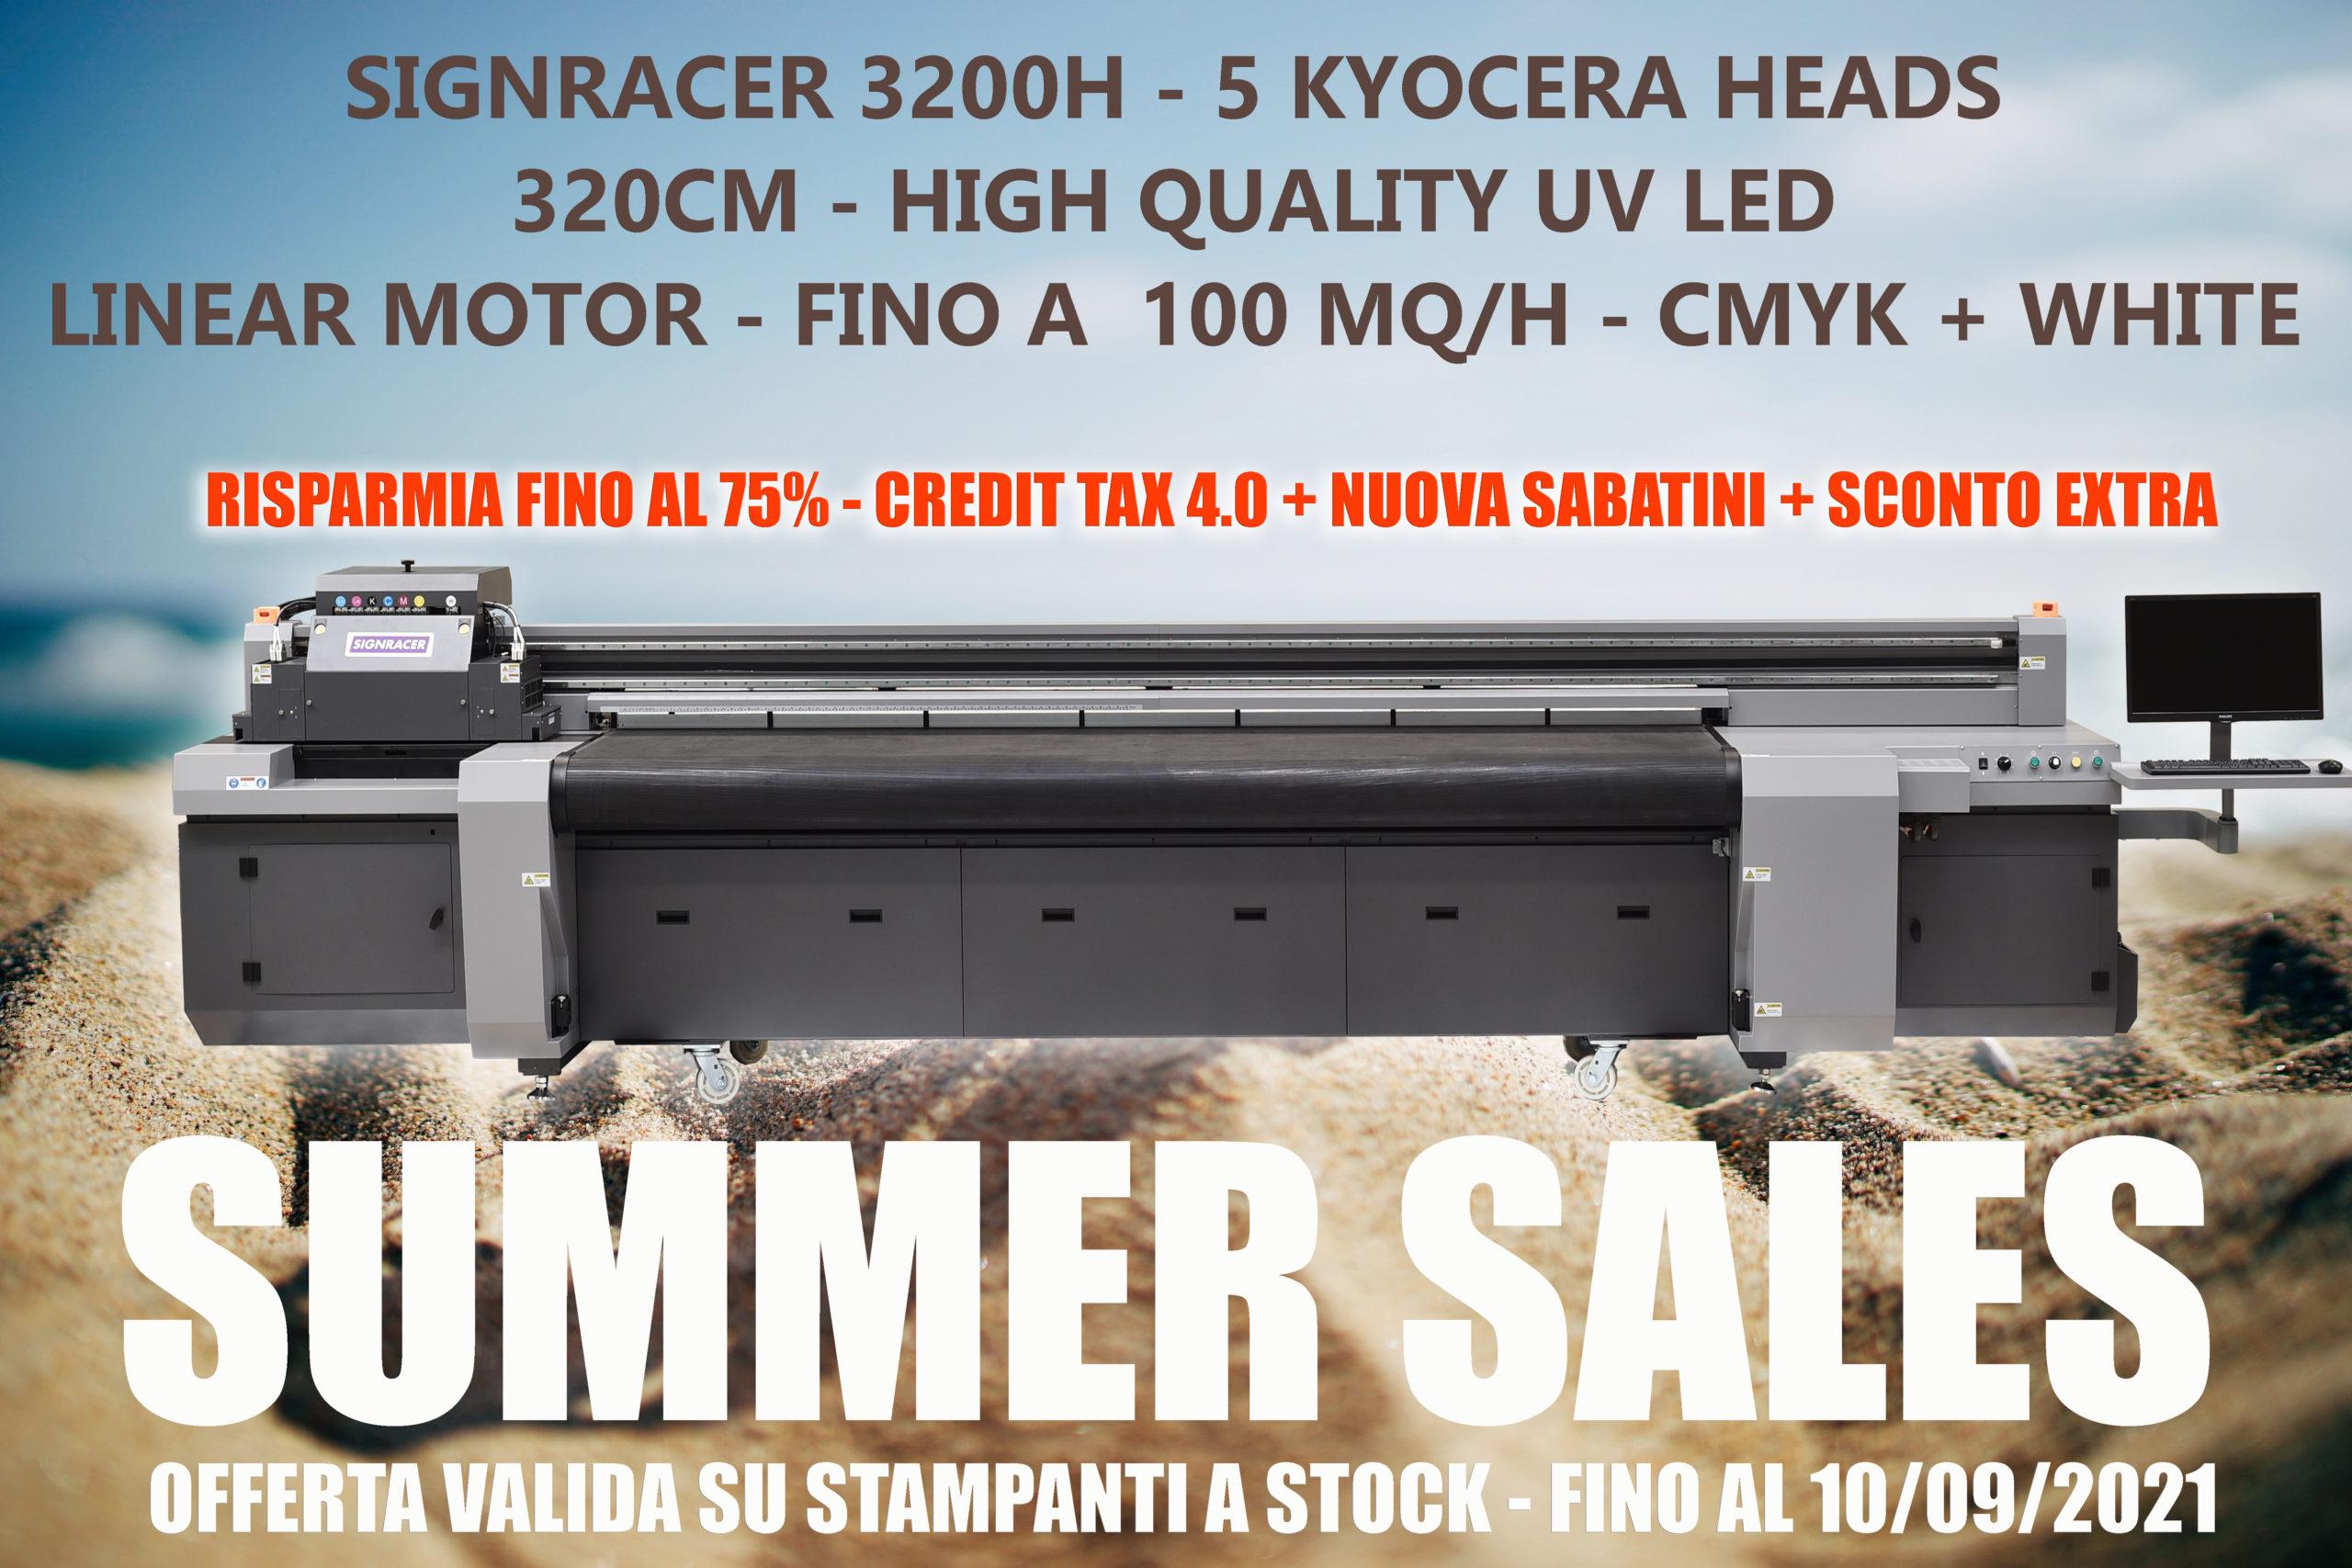 SUMMER SALES – 75% DI RISPARMIO SU SIGNRACER 3200 Hybrid Kyocera